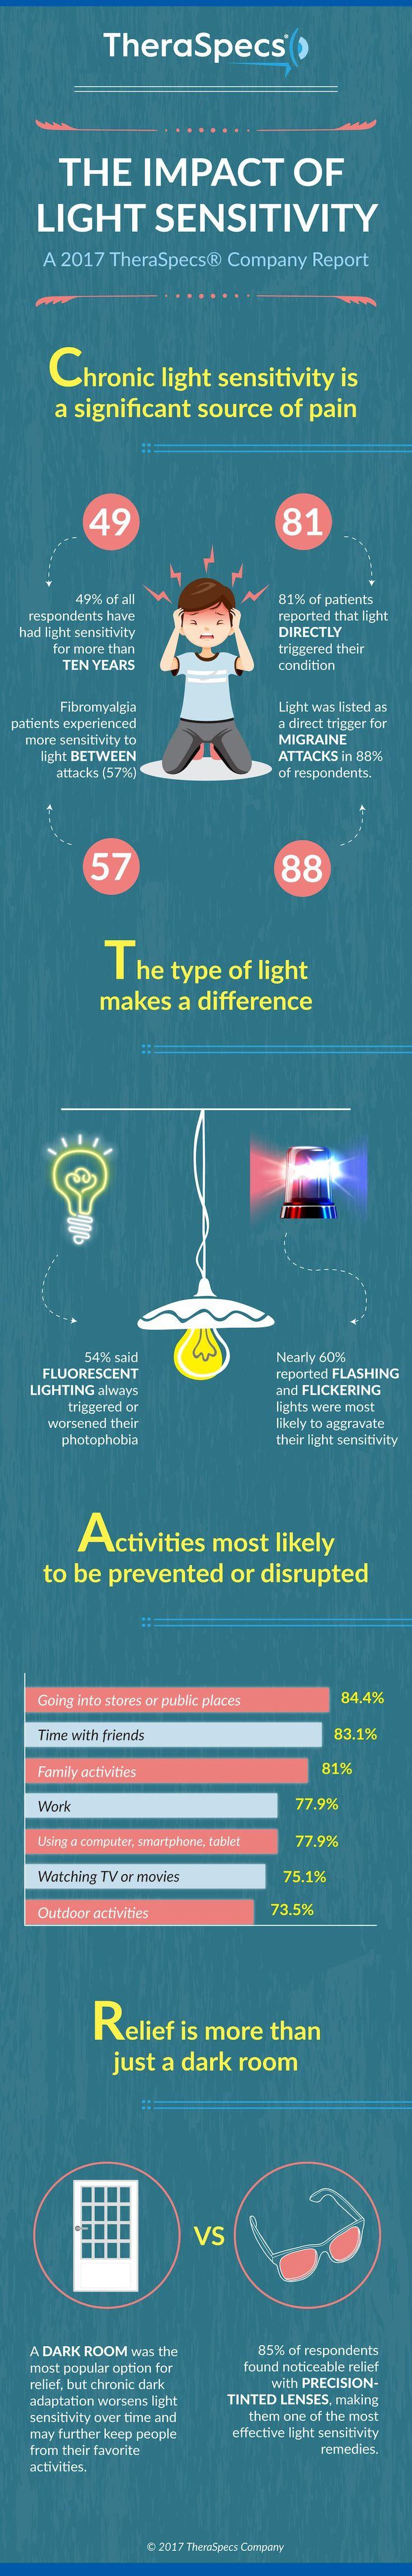 light sensitivity impact infographic